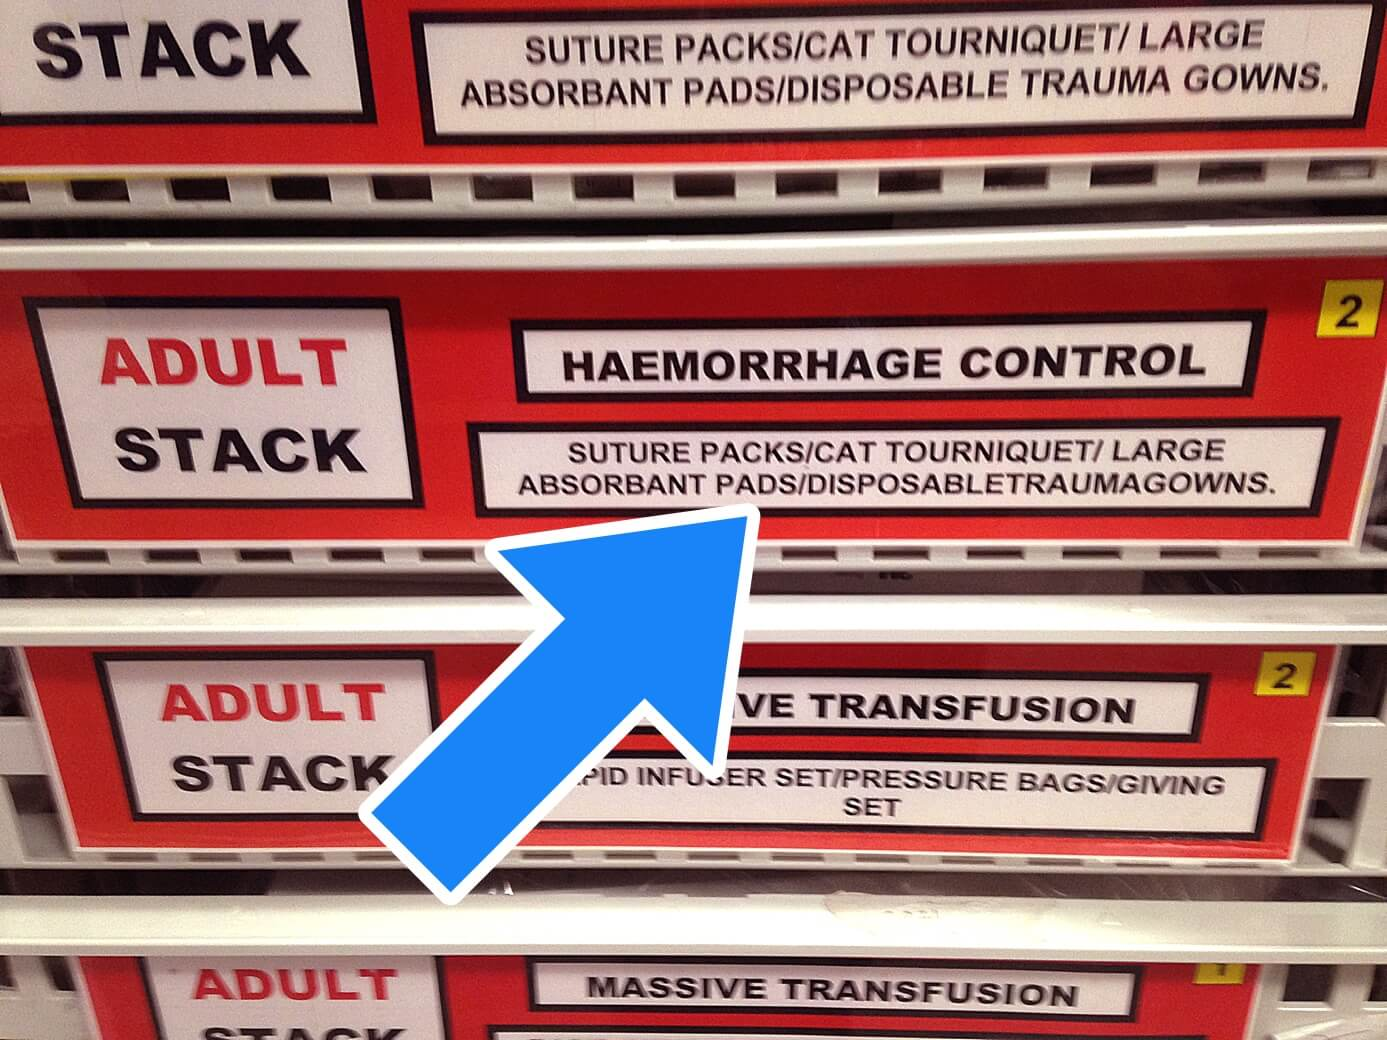 Haemorrhage Control - Resus stack.jpg